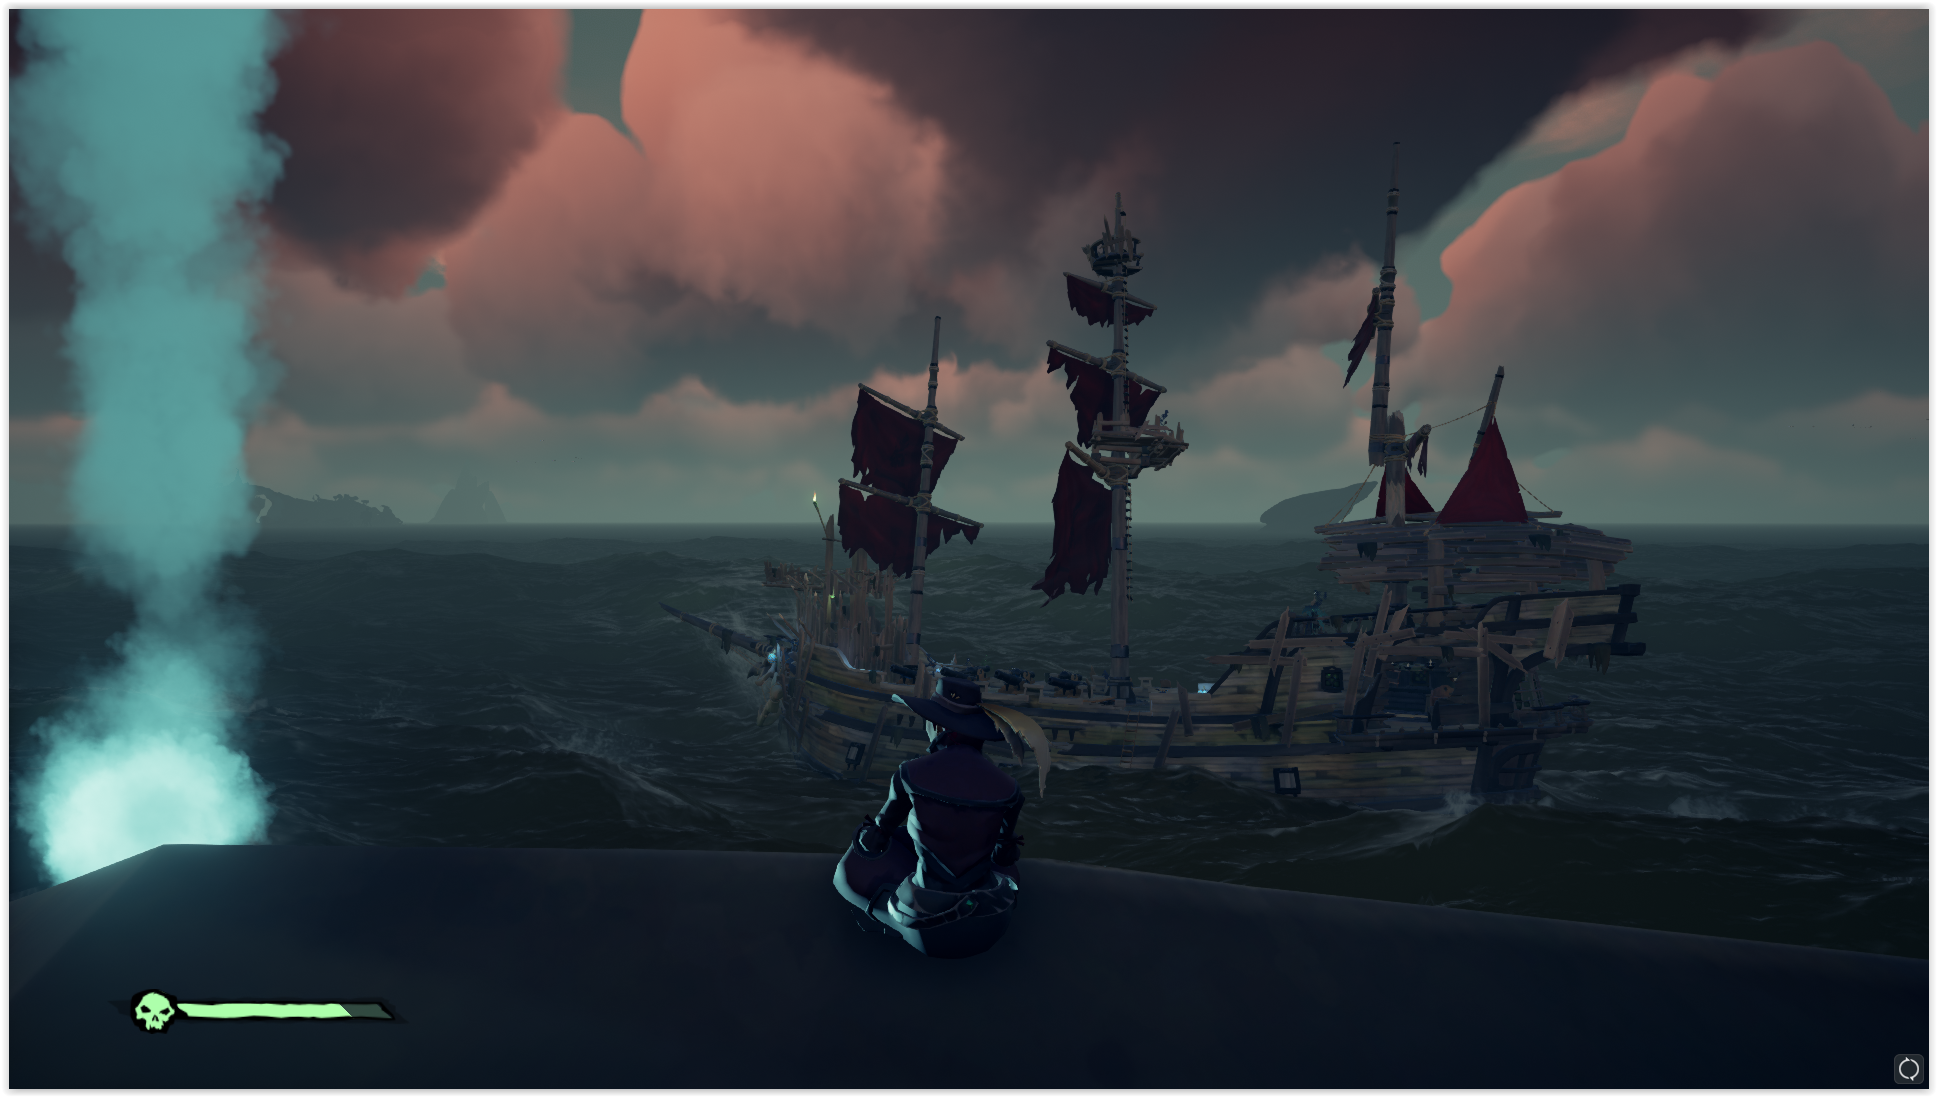 brown ship on shore illustration video games pirates Sea